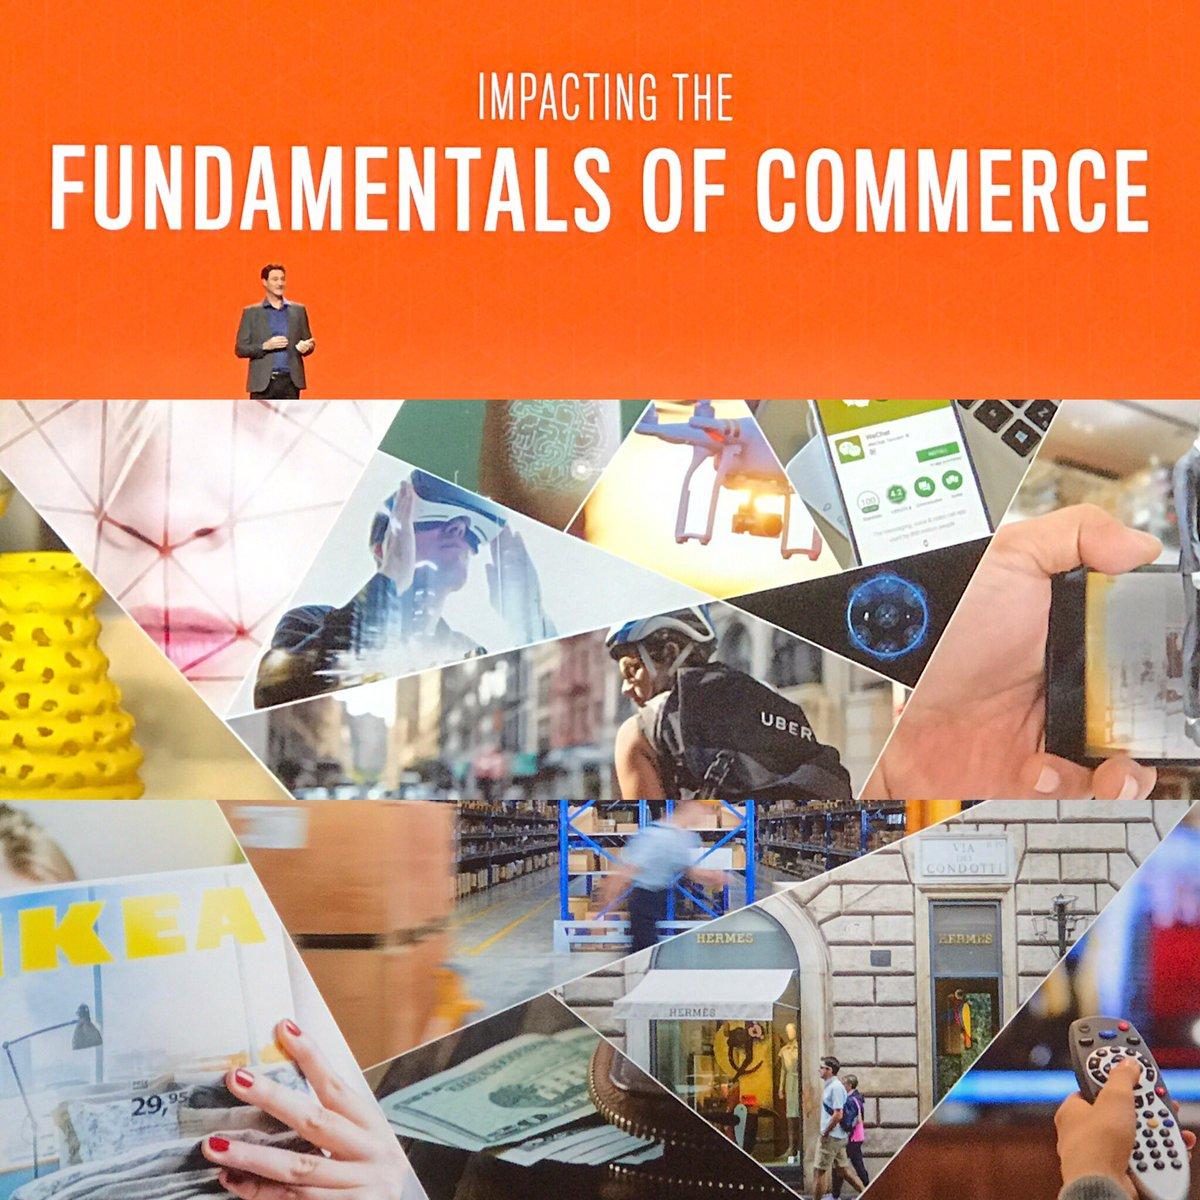 ignacioriesco: Impacting the fundamentals of commerce #magentoimagine @mklave1 https://t.co/k7f0eu1Yl4